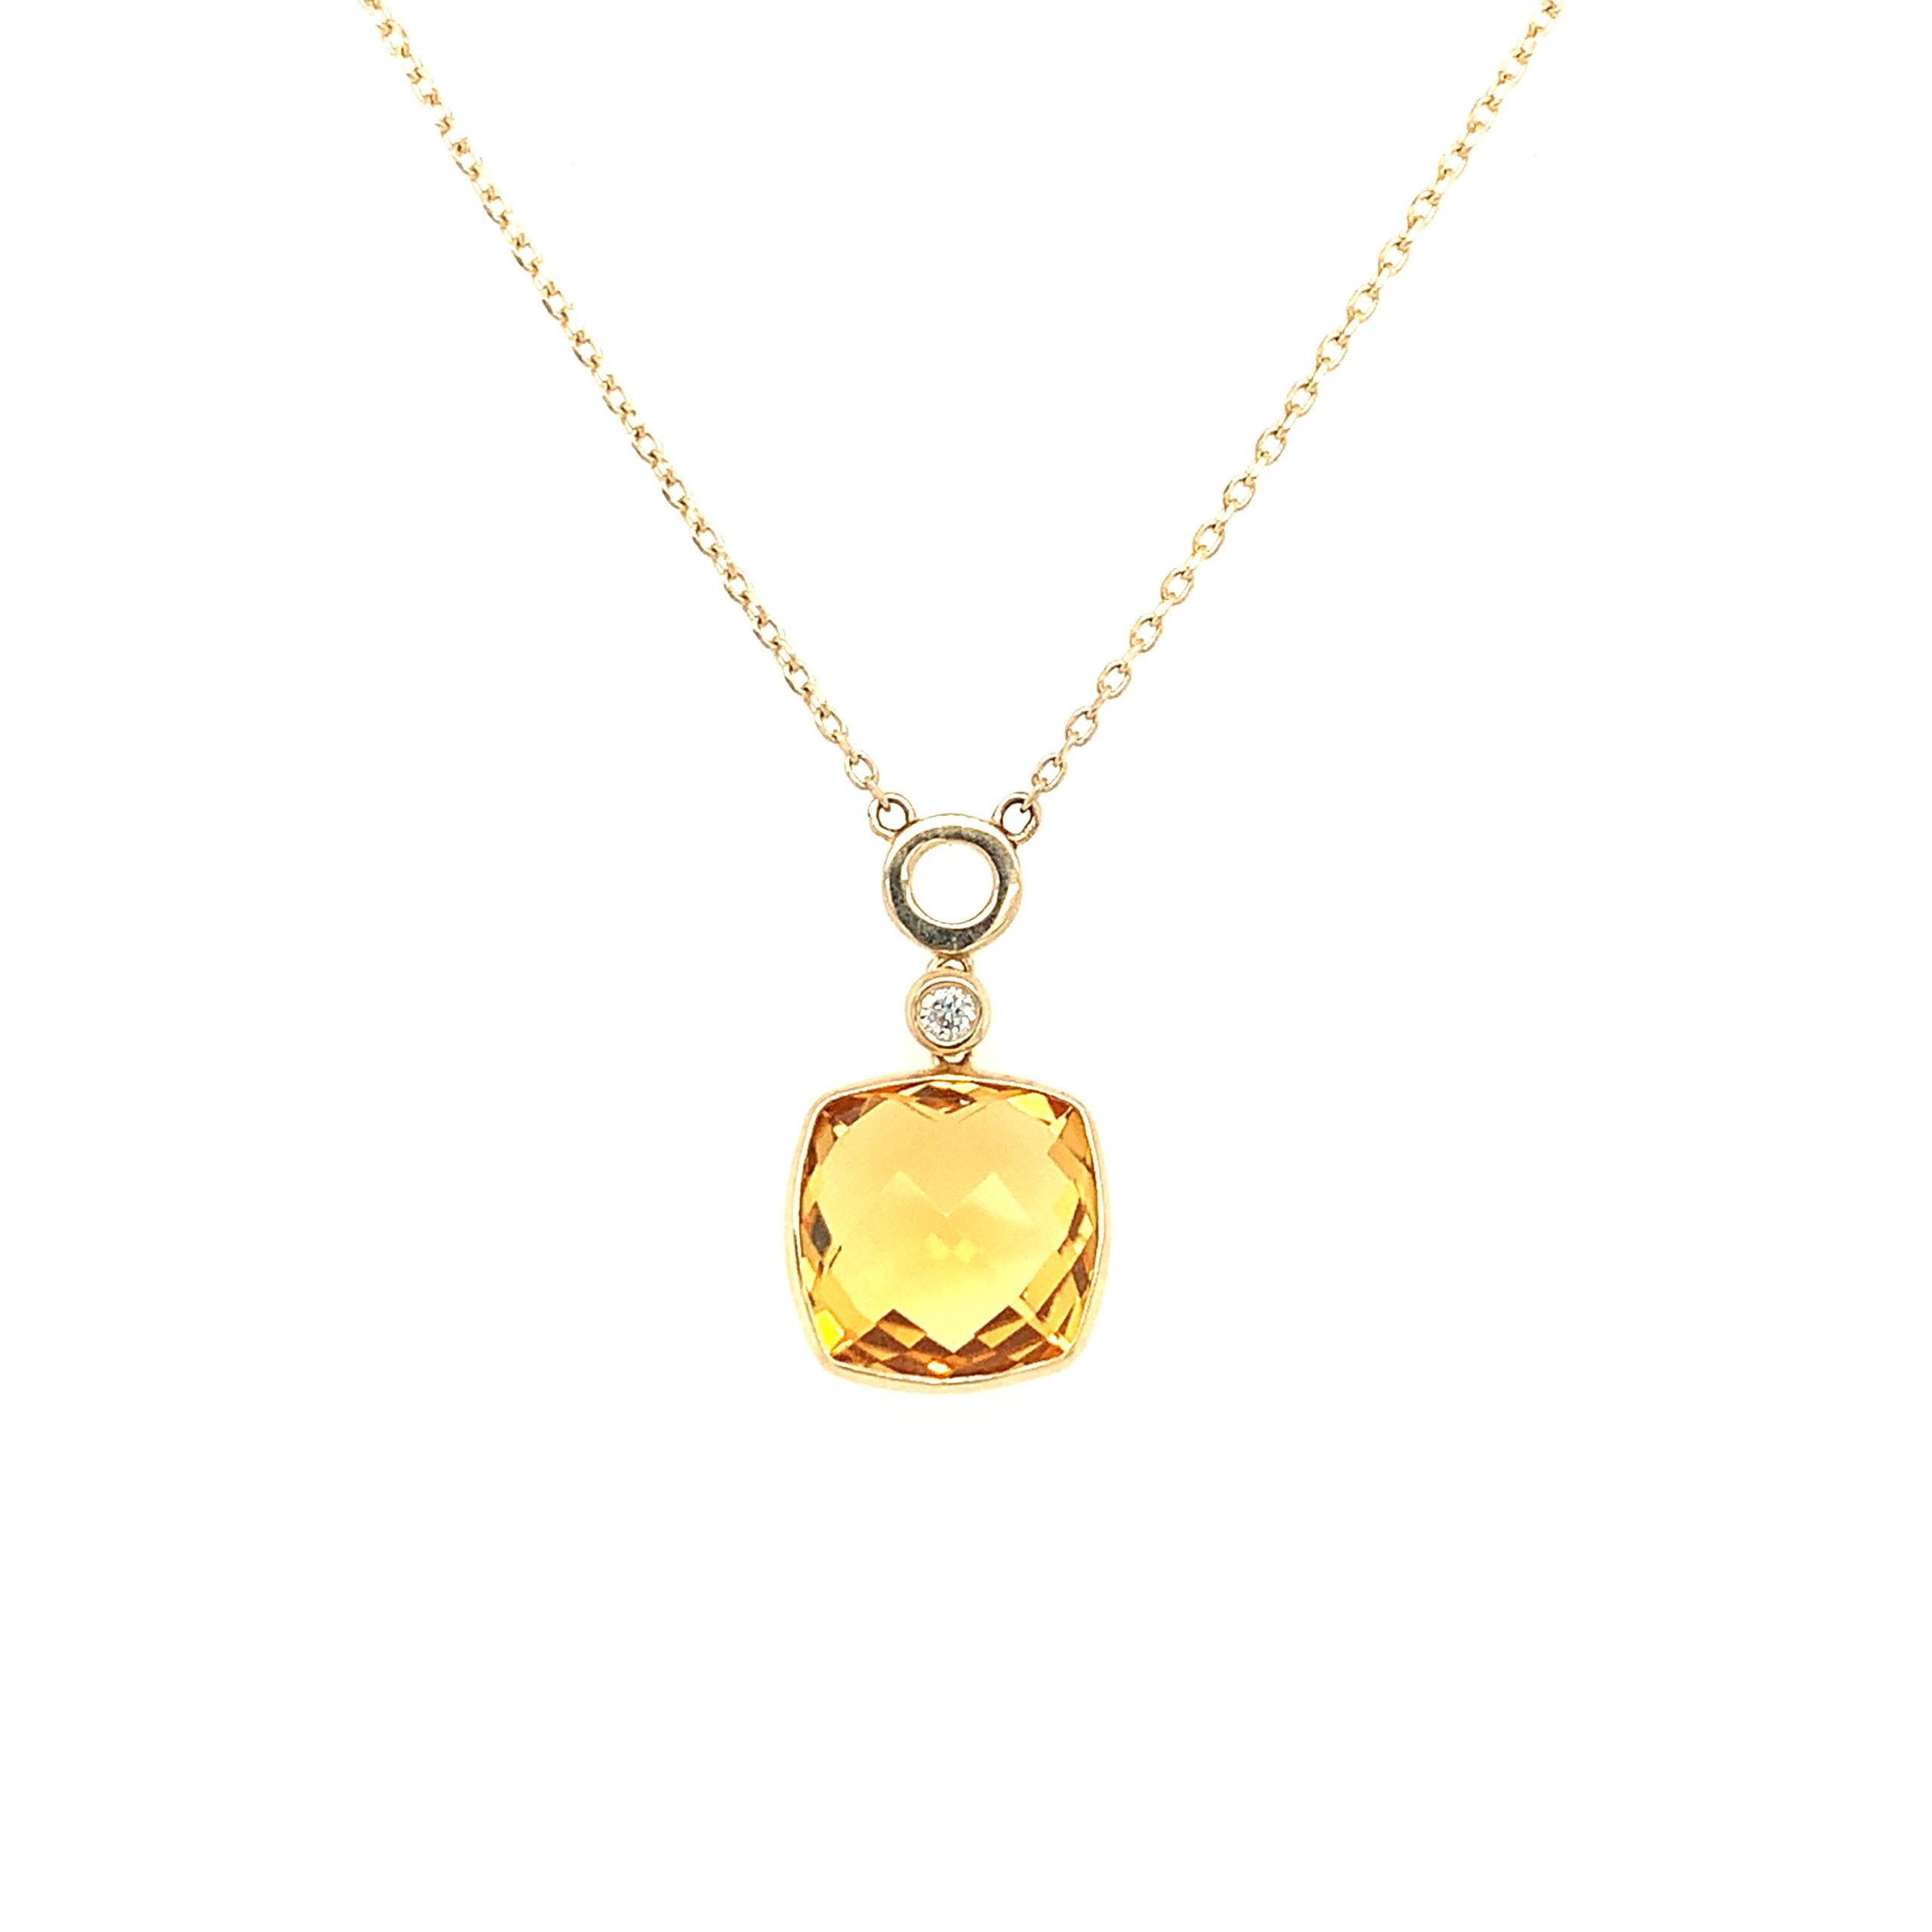 Yellow Gold Citrine Pendant Necklace